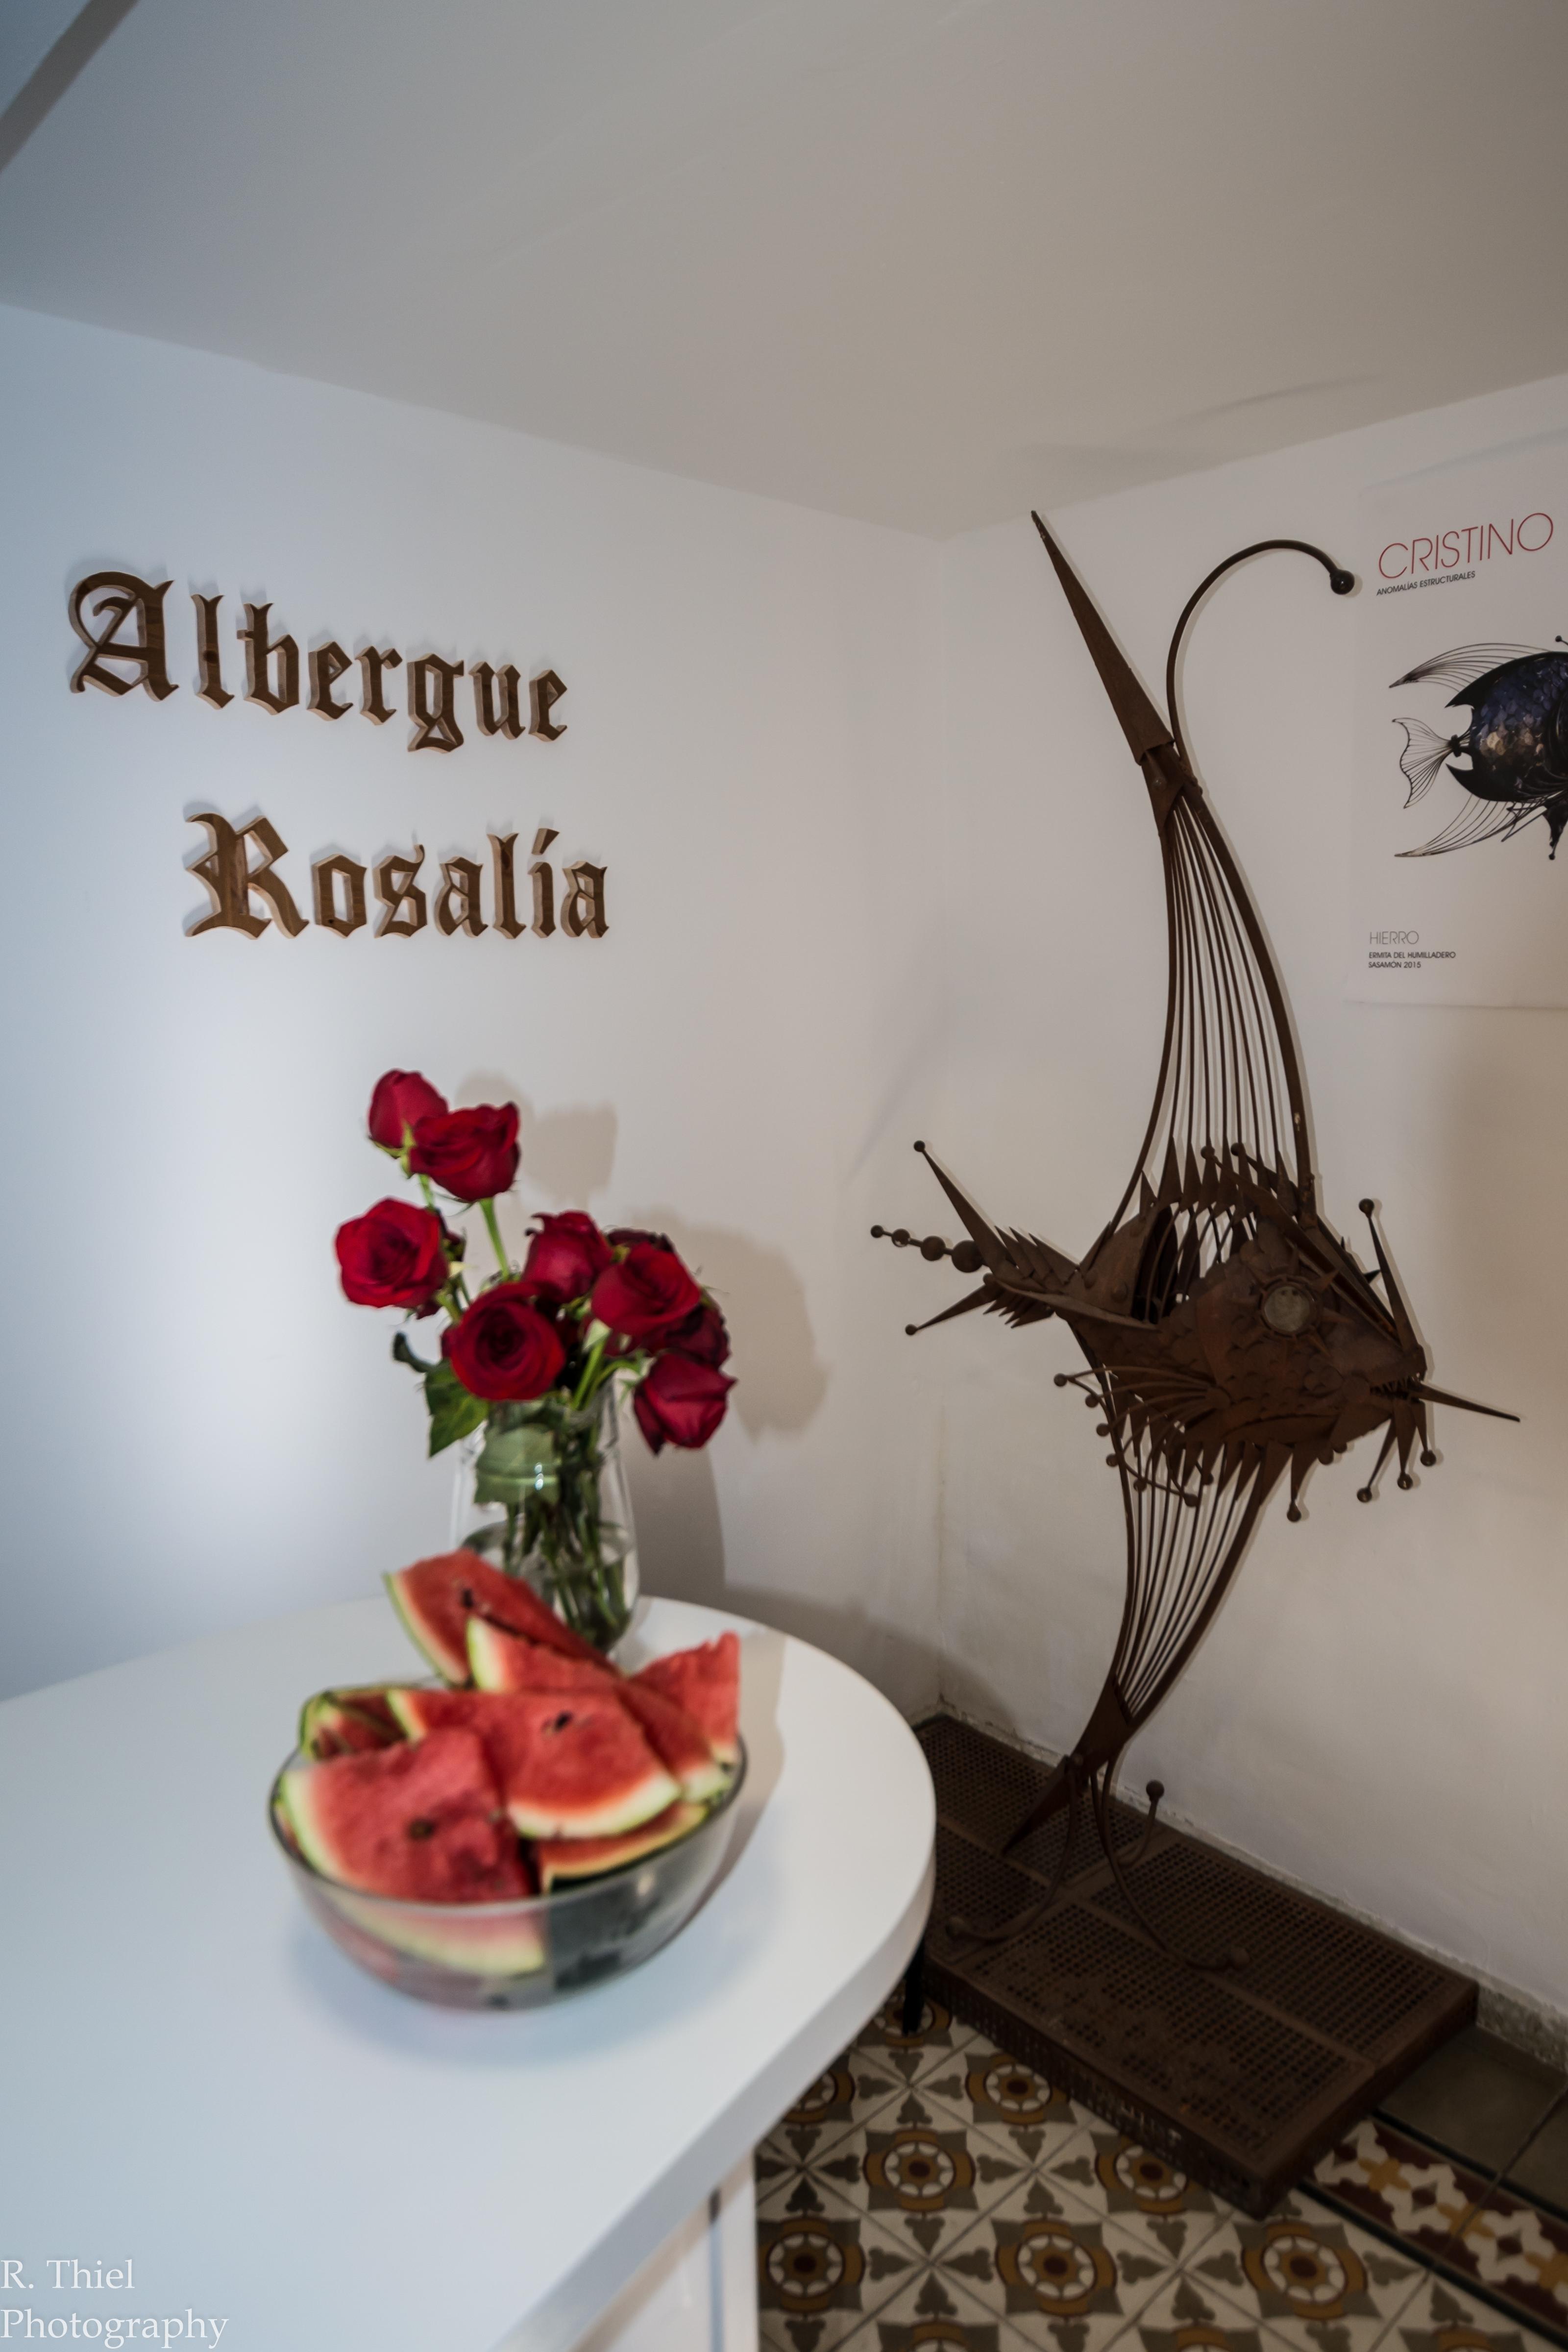 Rosalia albergue